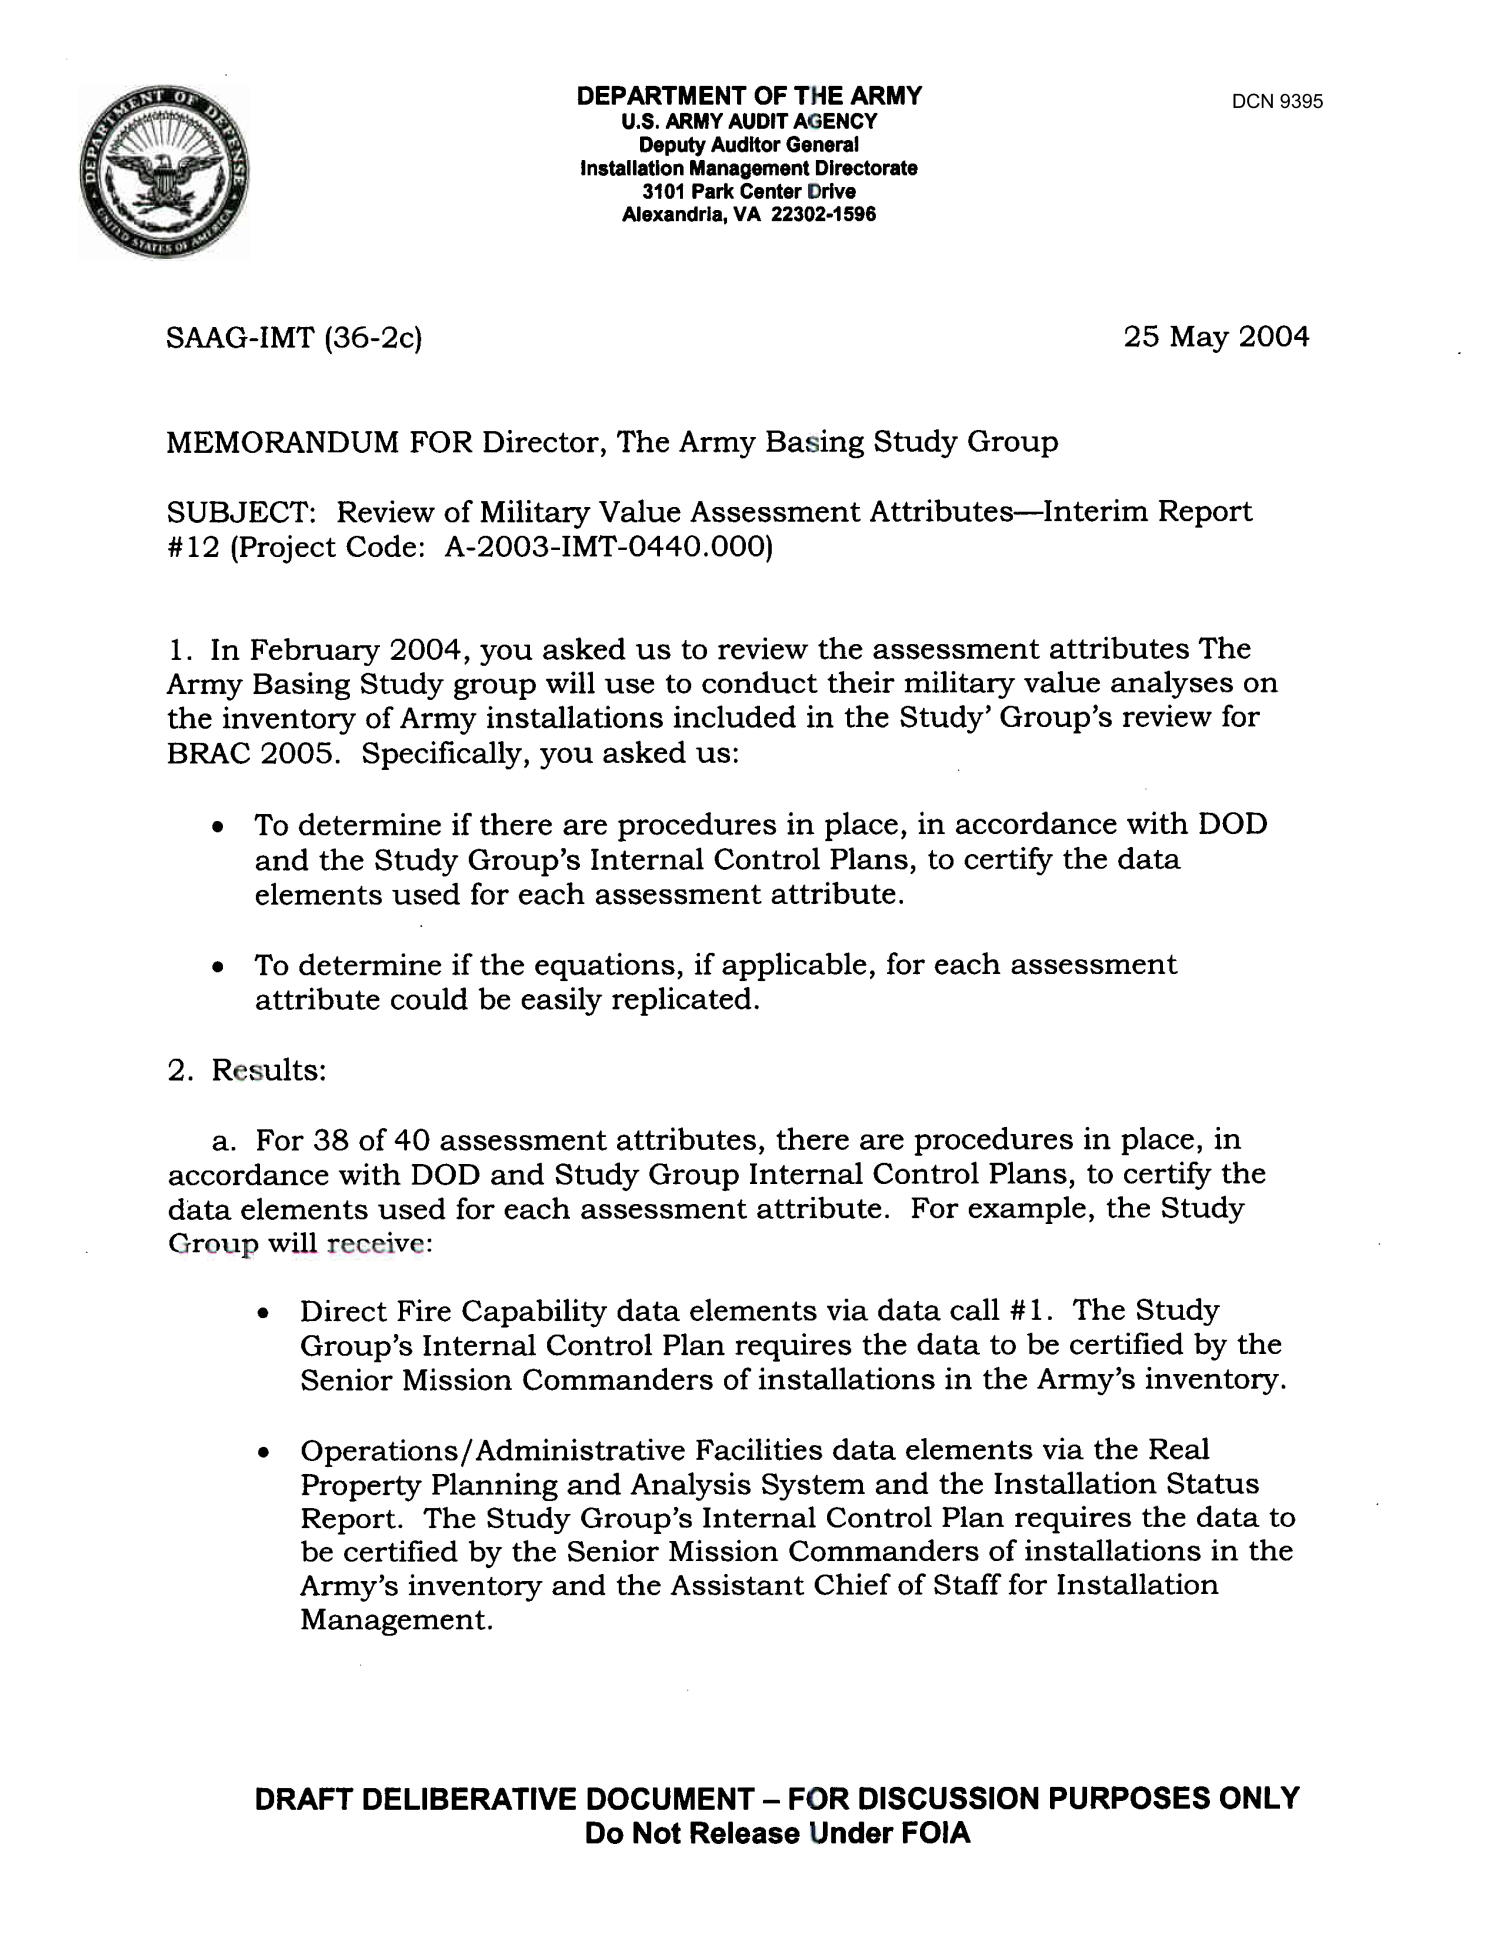 memorandum for director  the army basing study group